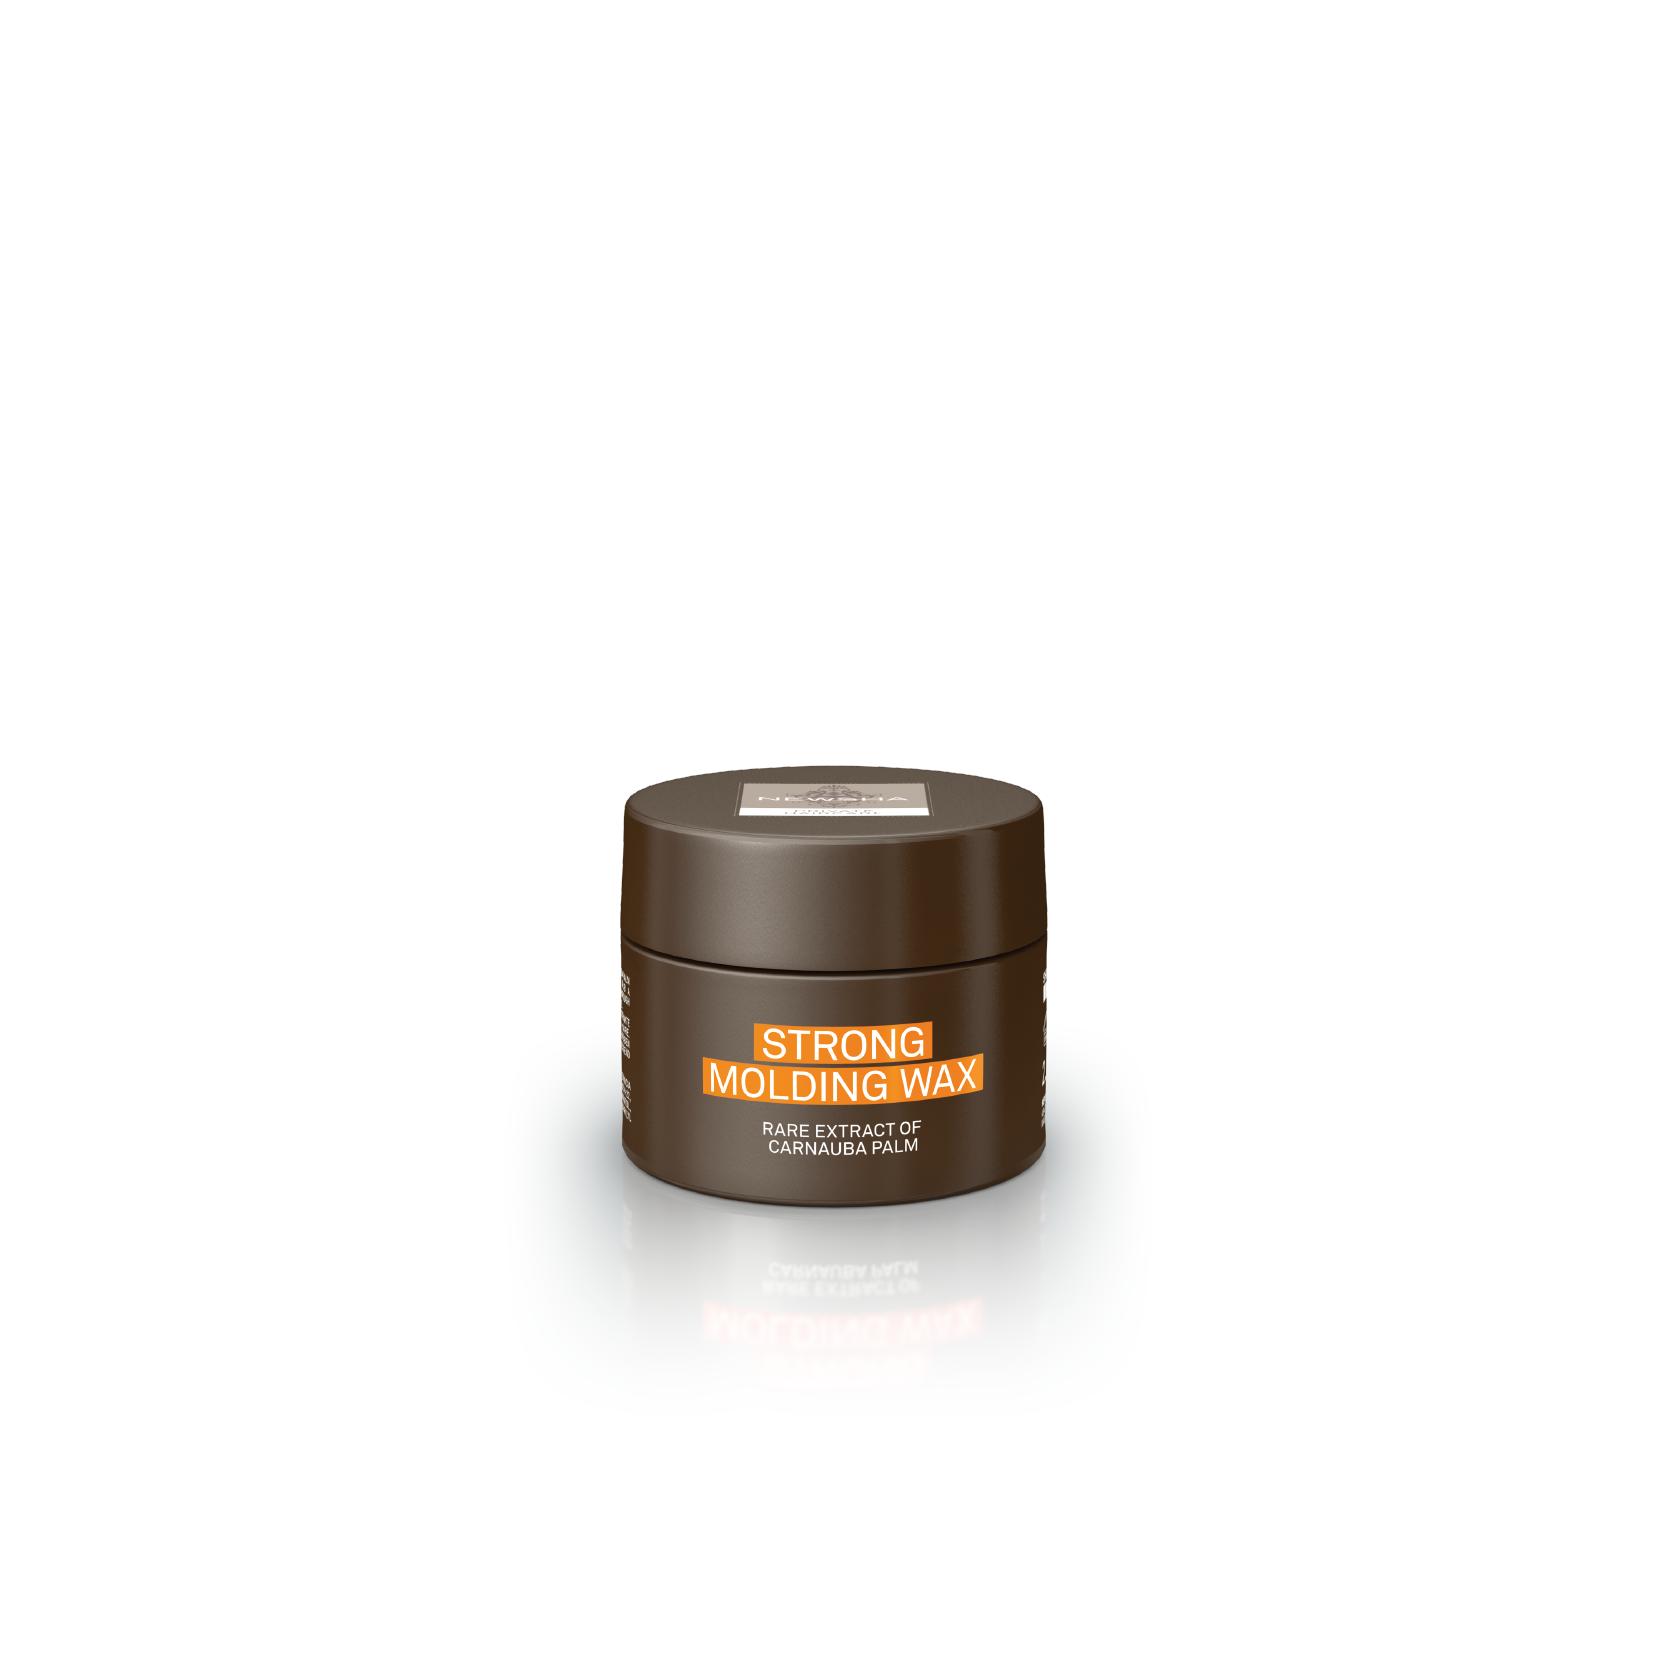 Newsha Product Shots-Strong Molding Wax.png